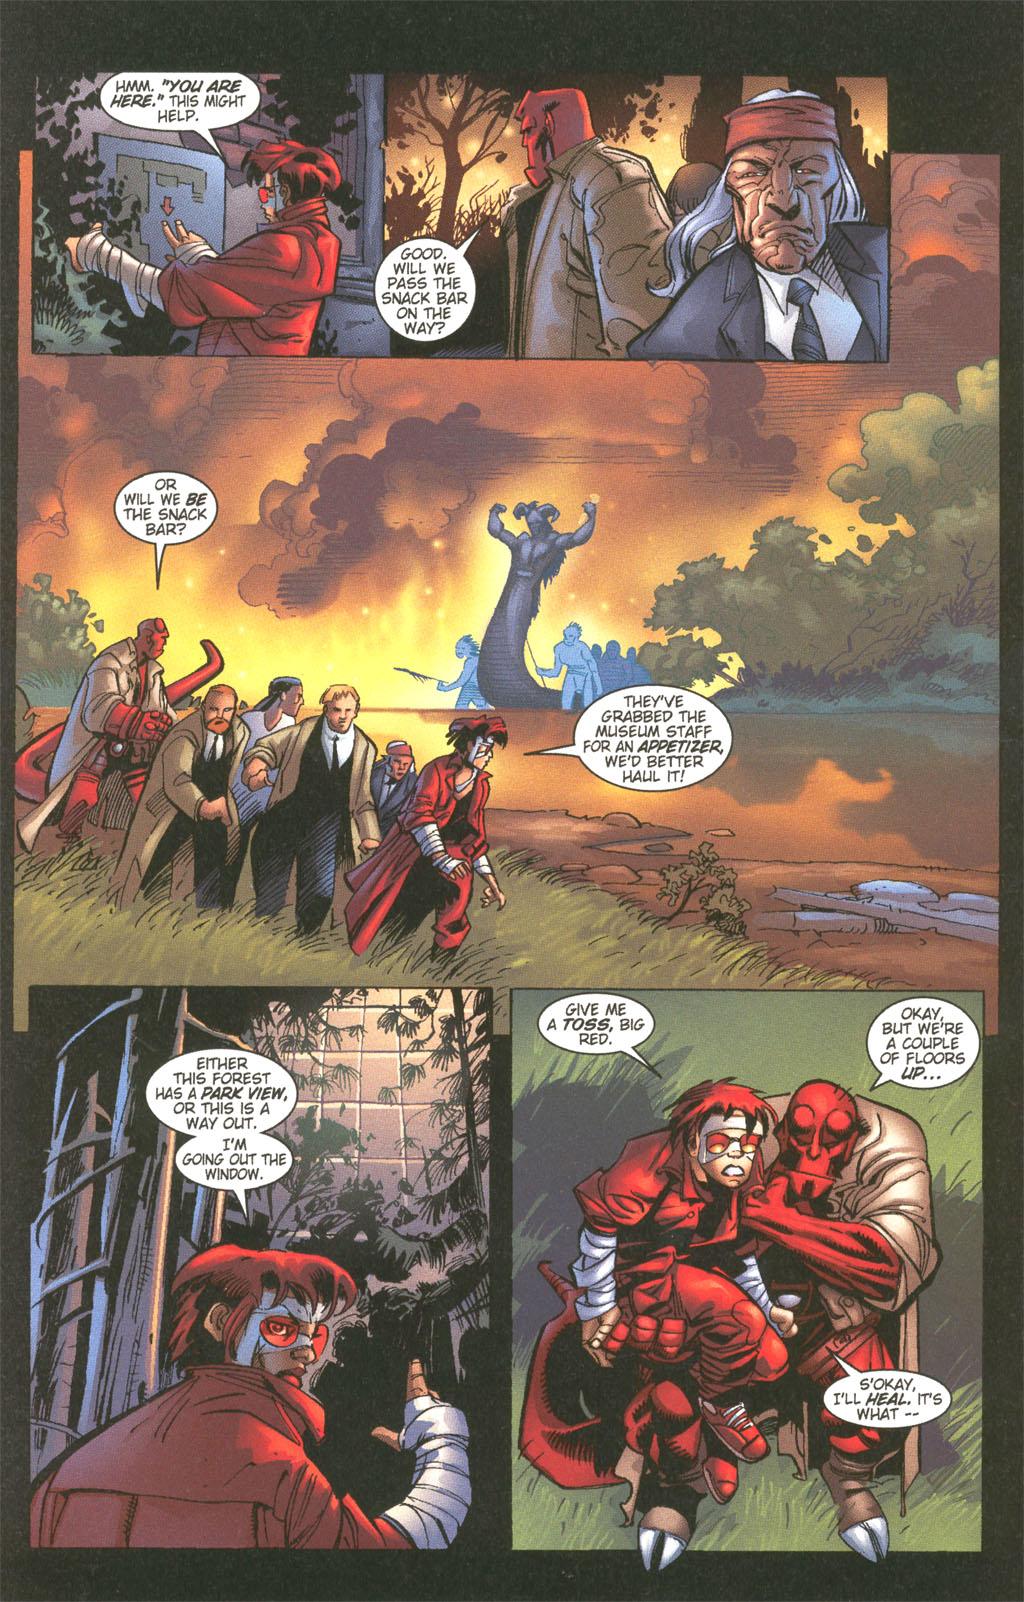 Read online Painkiller Jane/Hellboy comic -  Issue # Full - 18